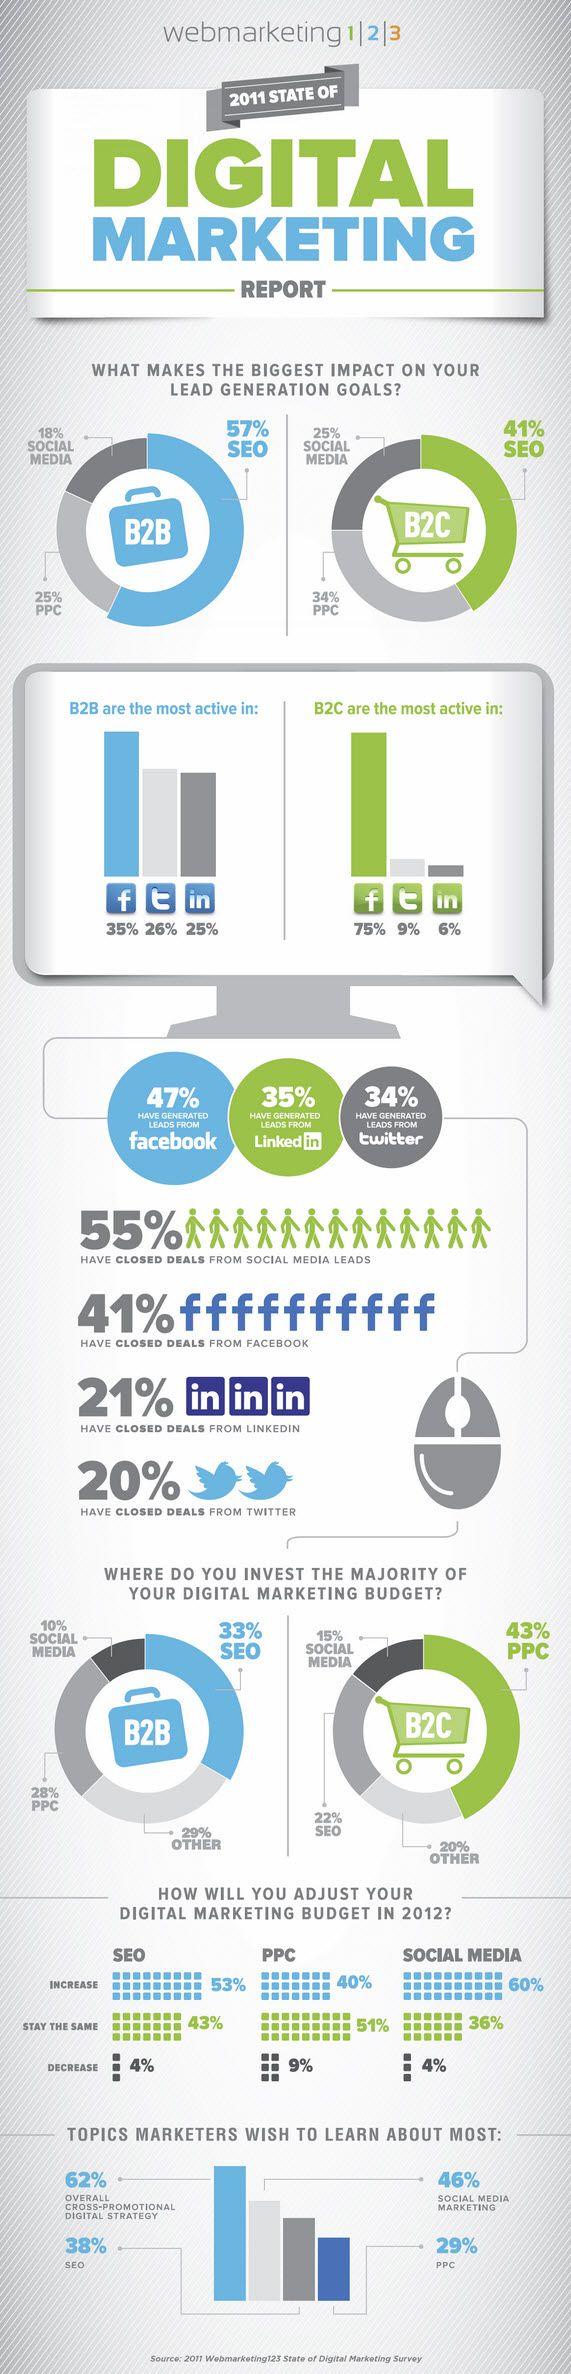 Digital Marketing Report #marketingdigital #Socialmedia